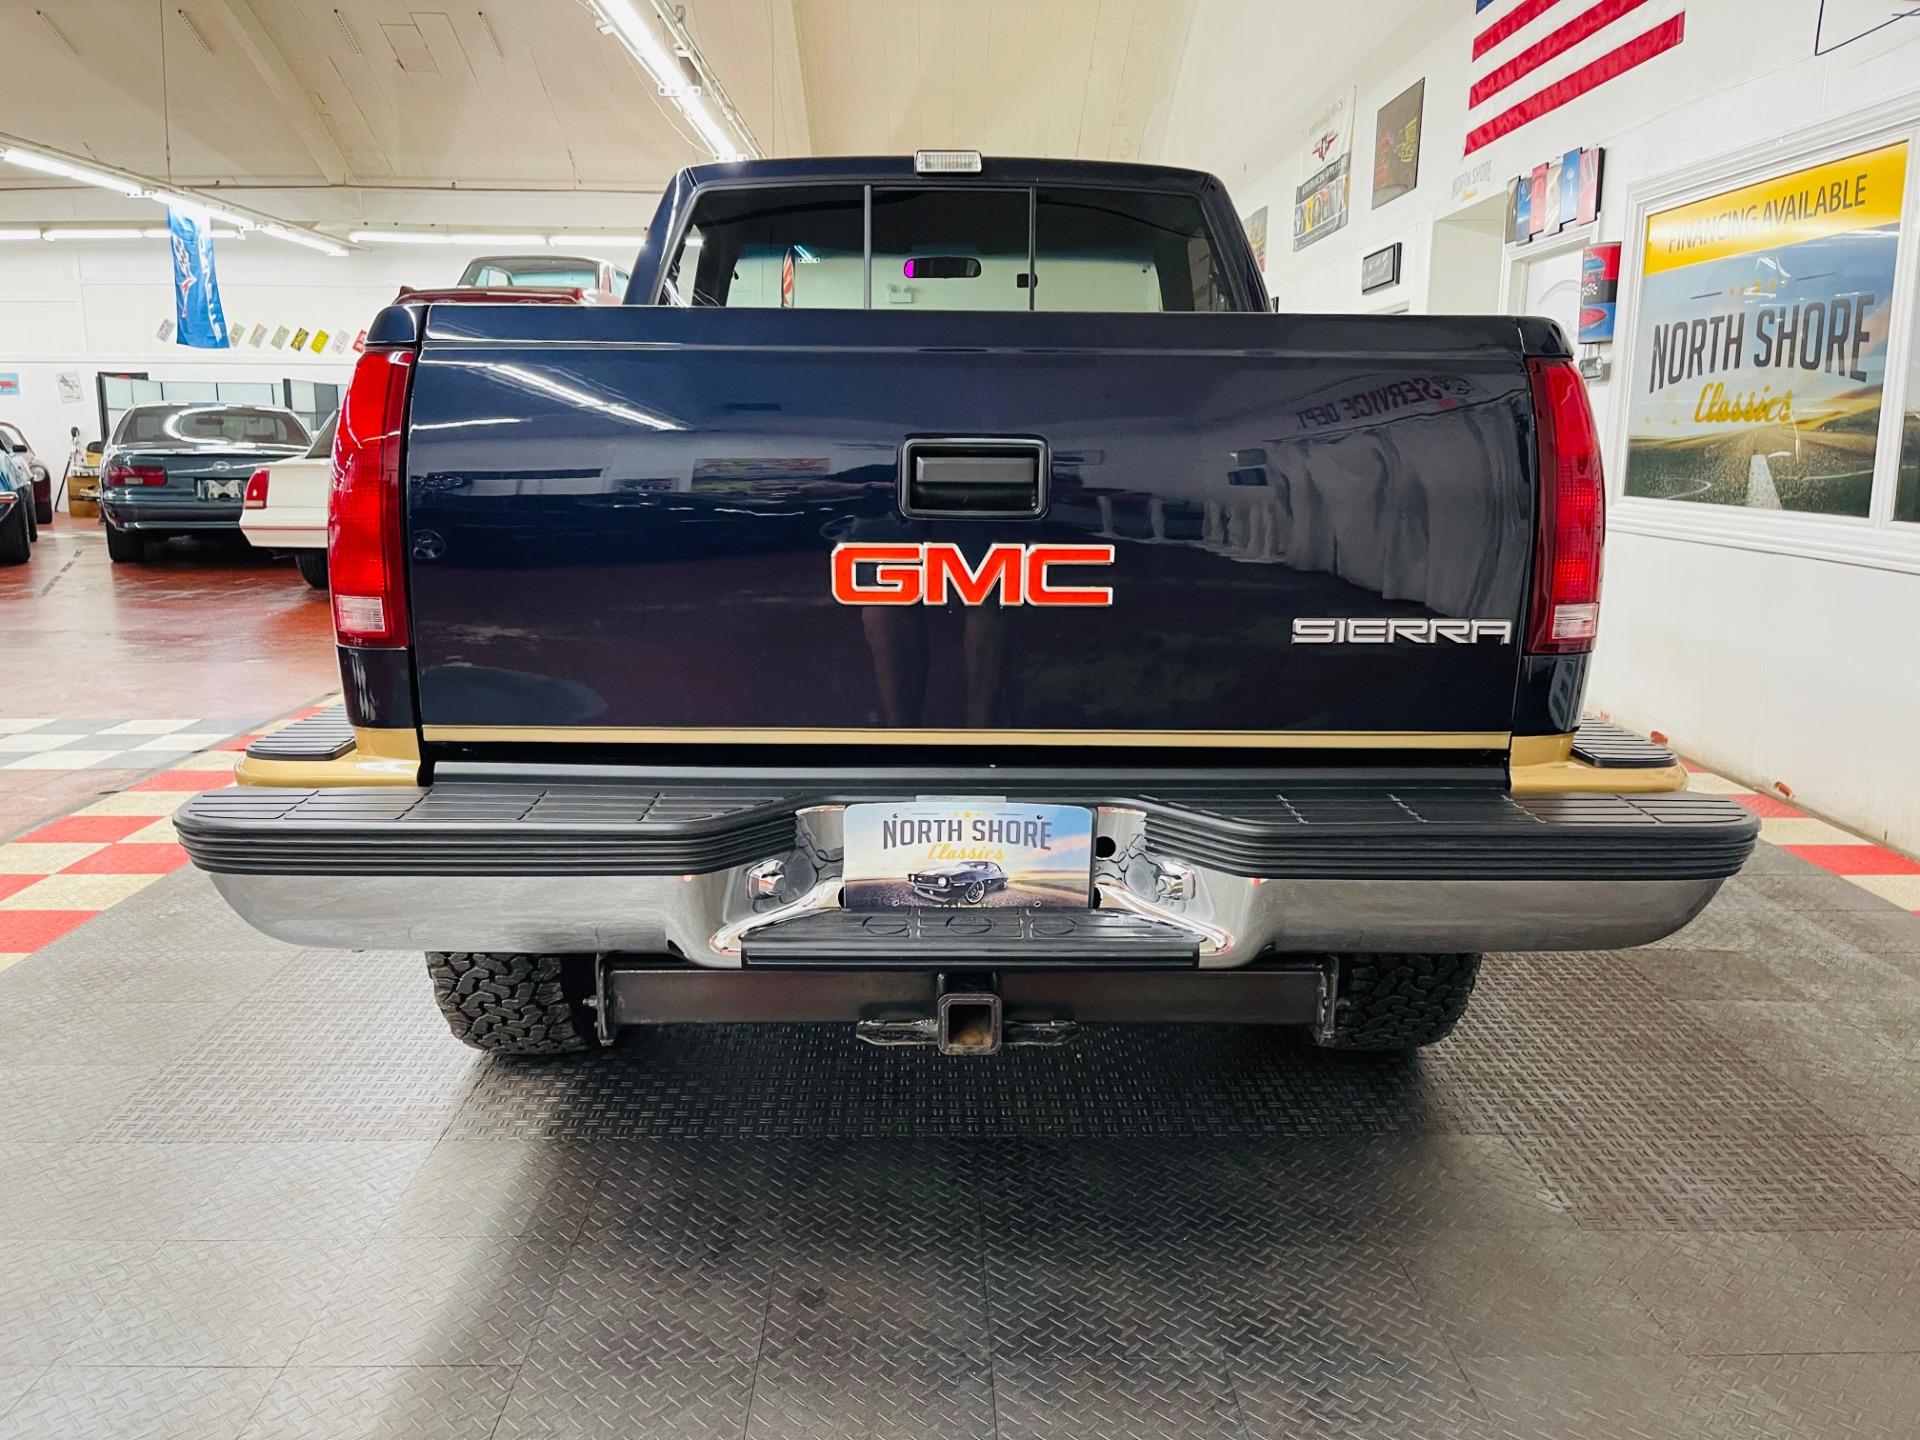 Used 1990 GMC Sierra 1500 - SLE - 4X4 - STEP SIDE - FRESH RESTORATION - SEE VIDEO | Mundelein, IL